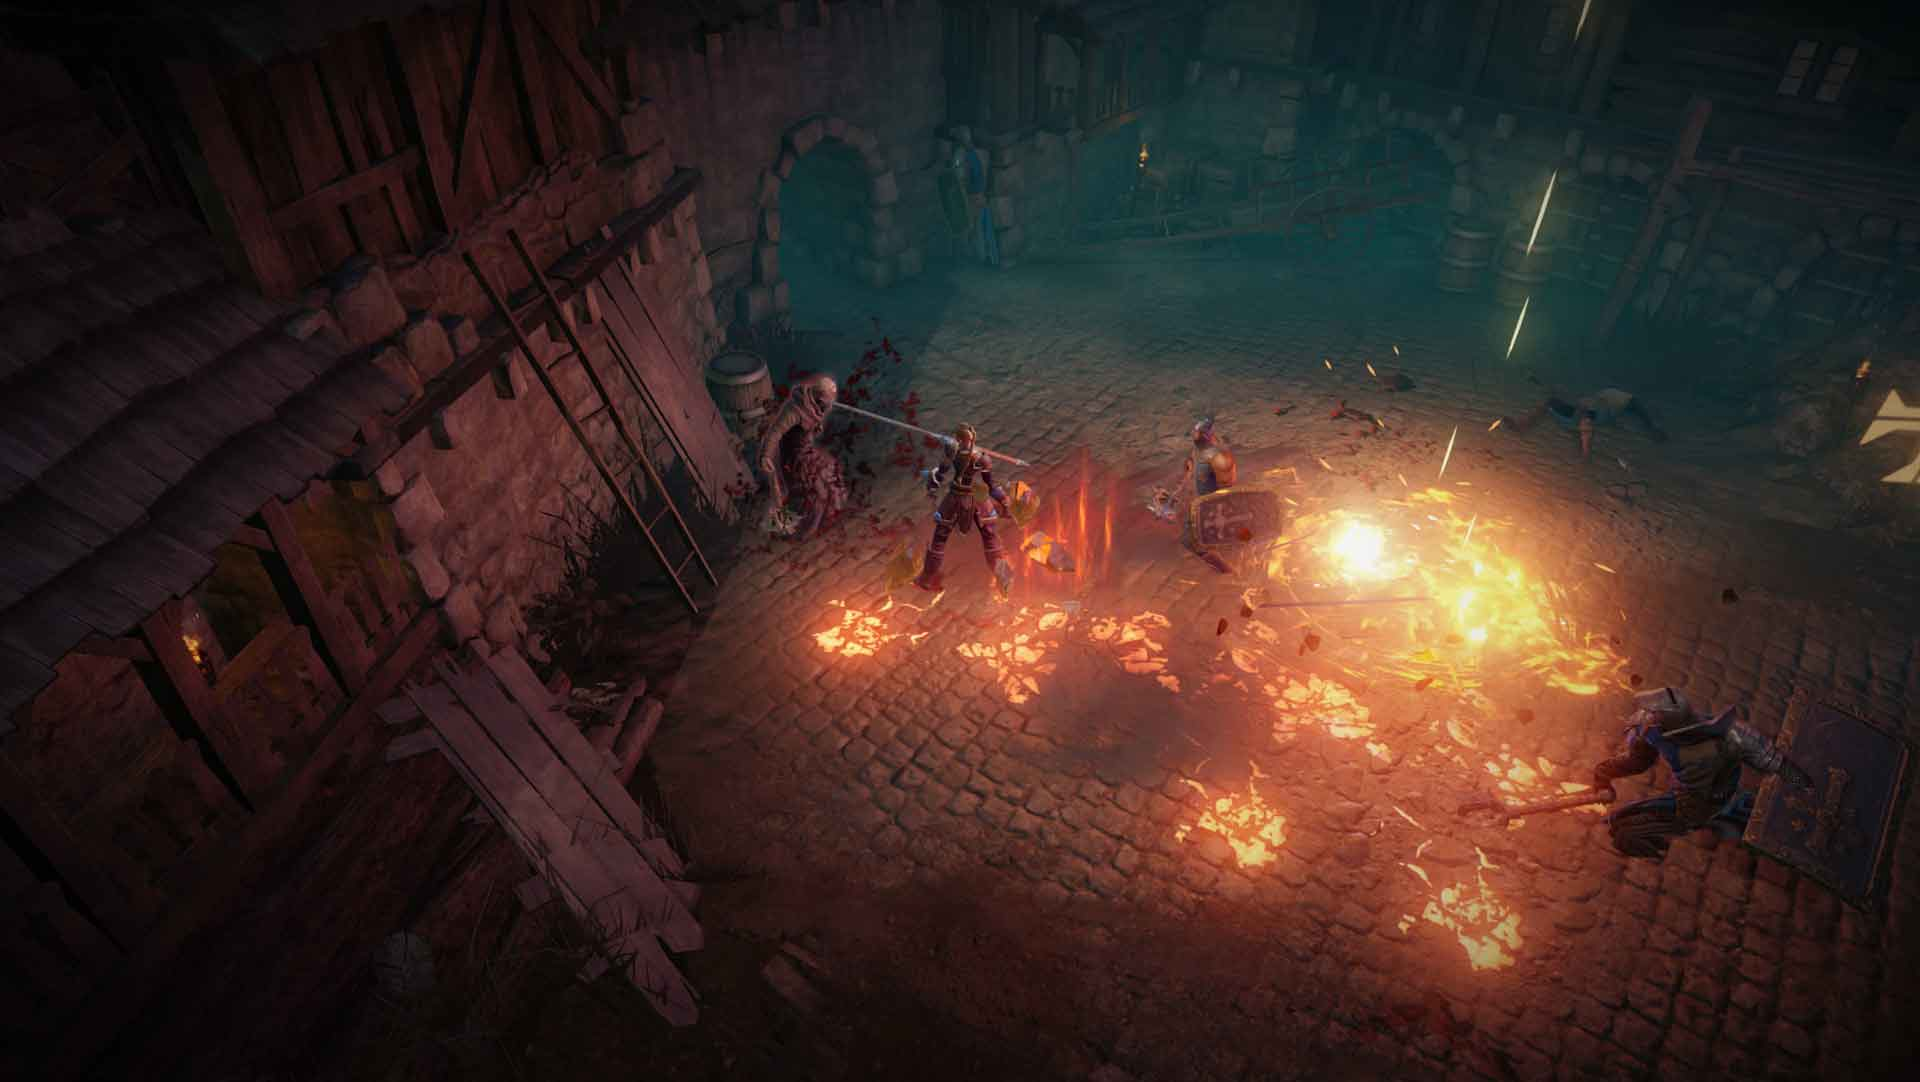 Vikings - Wolves of Midgard game image